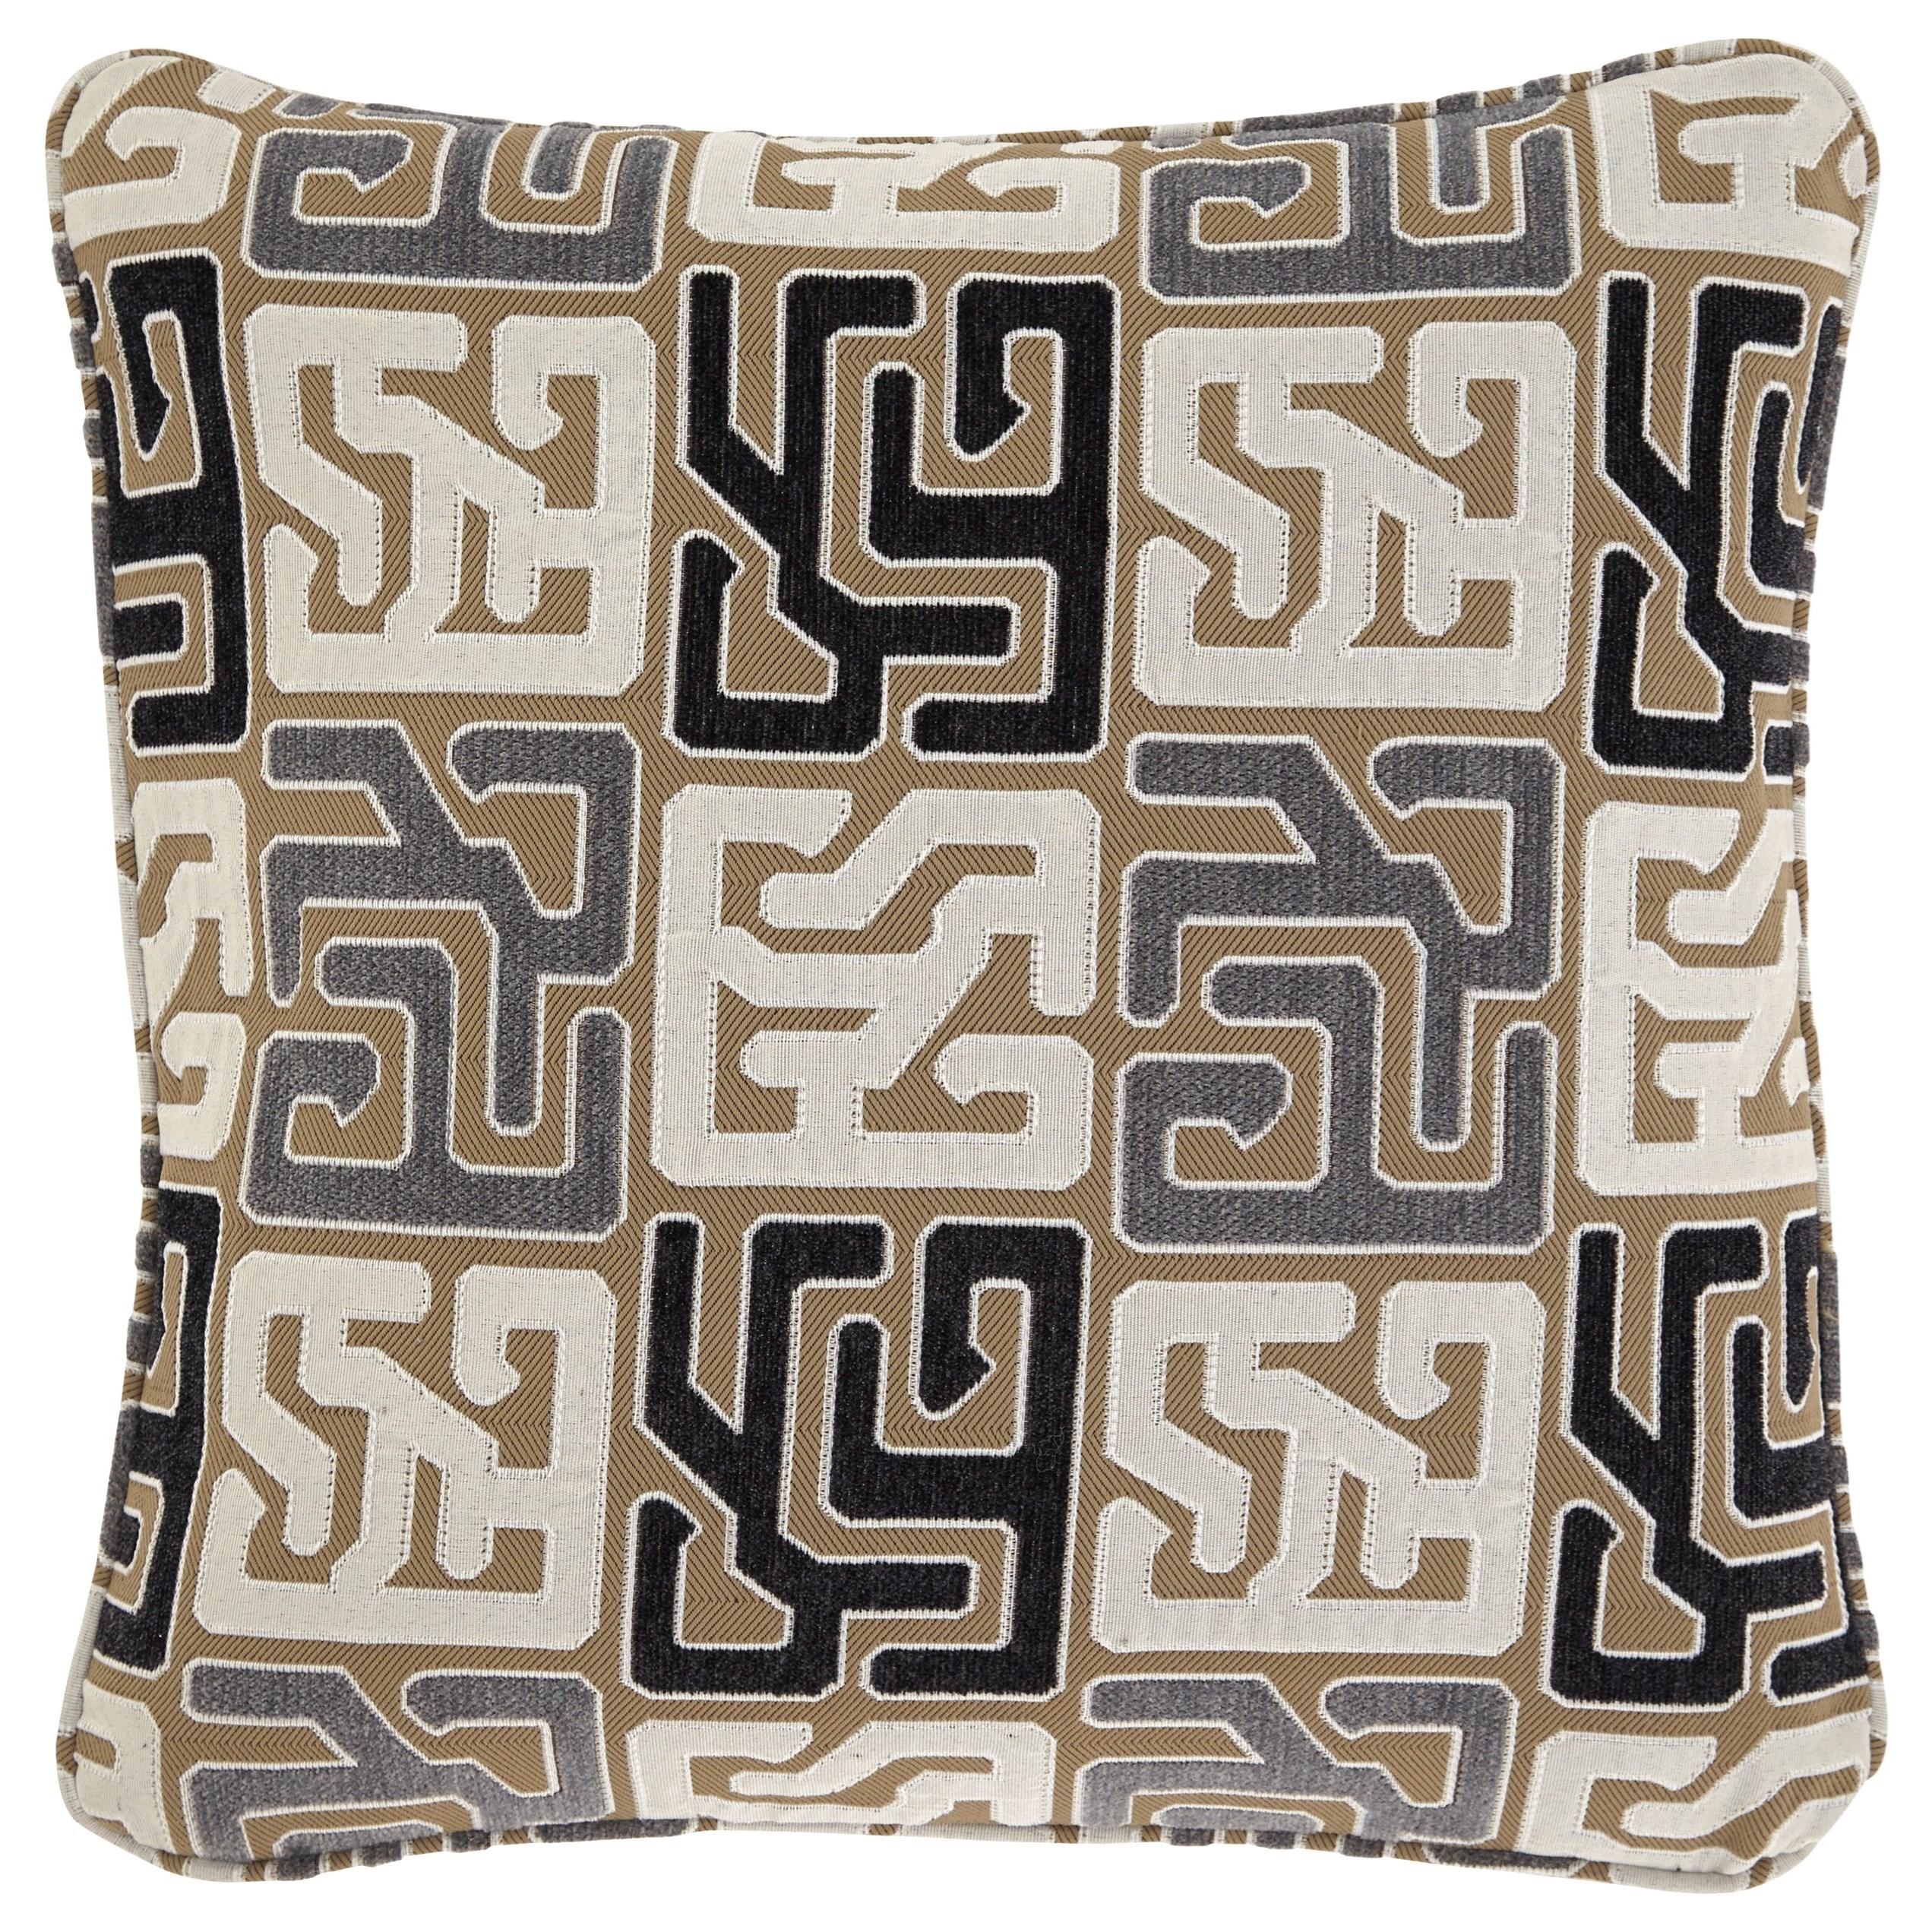 Pillows Tillamook Black/Tan/Gray Pillow by Signature Design by Ashley at Dream Home Interiors